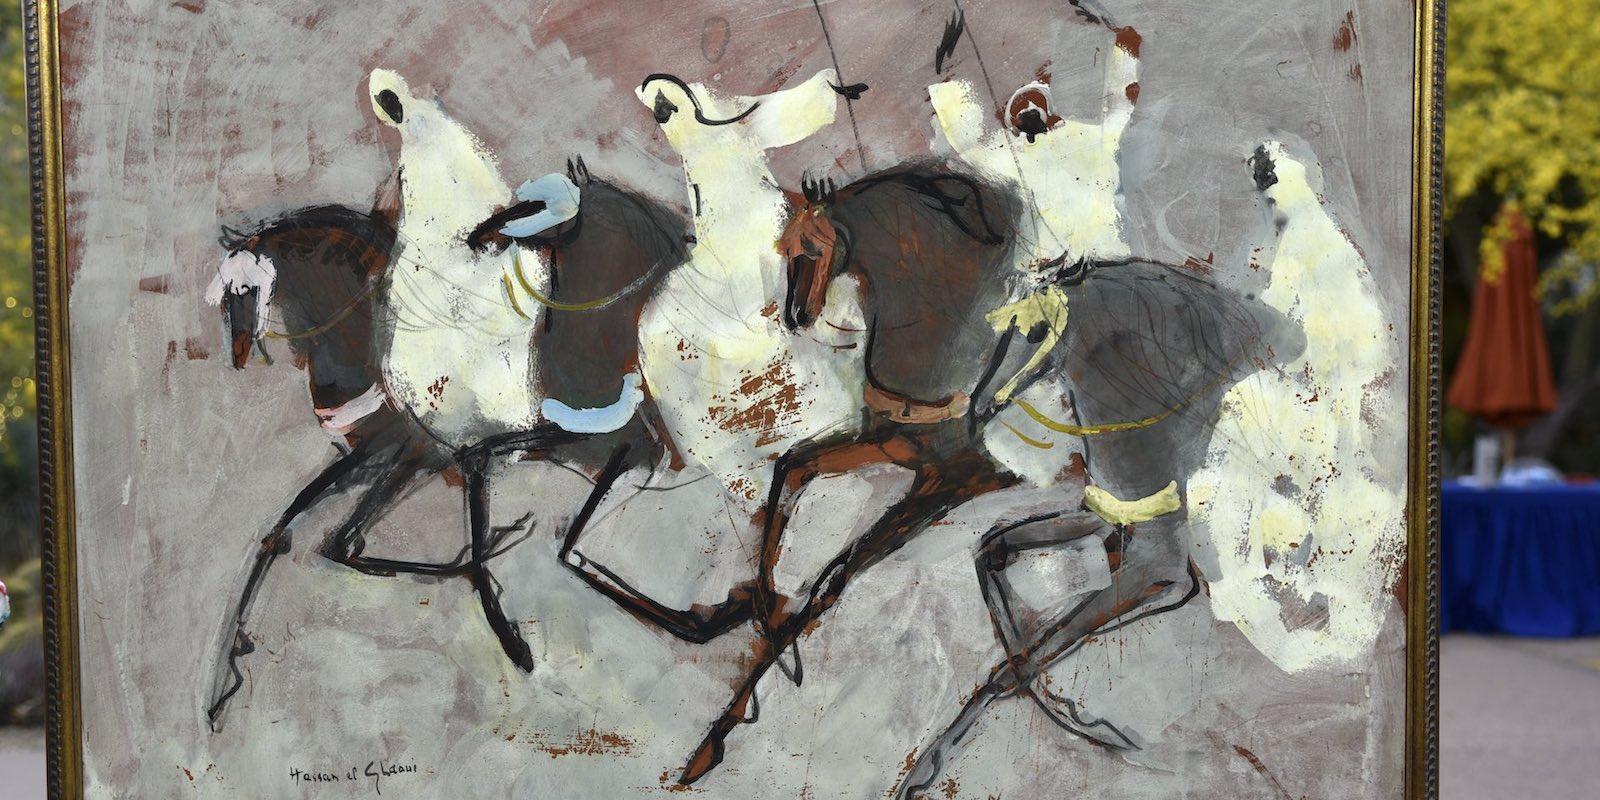 https://www-tc.pbs.org/prod-media/antiques-roadshow/article/images/El-Glaoui-painting_full-lede.jpg